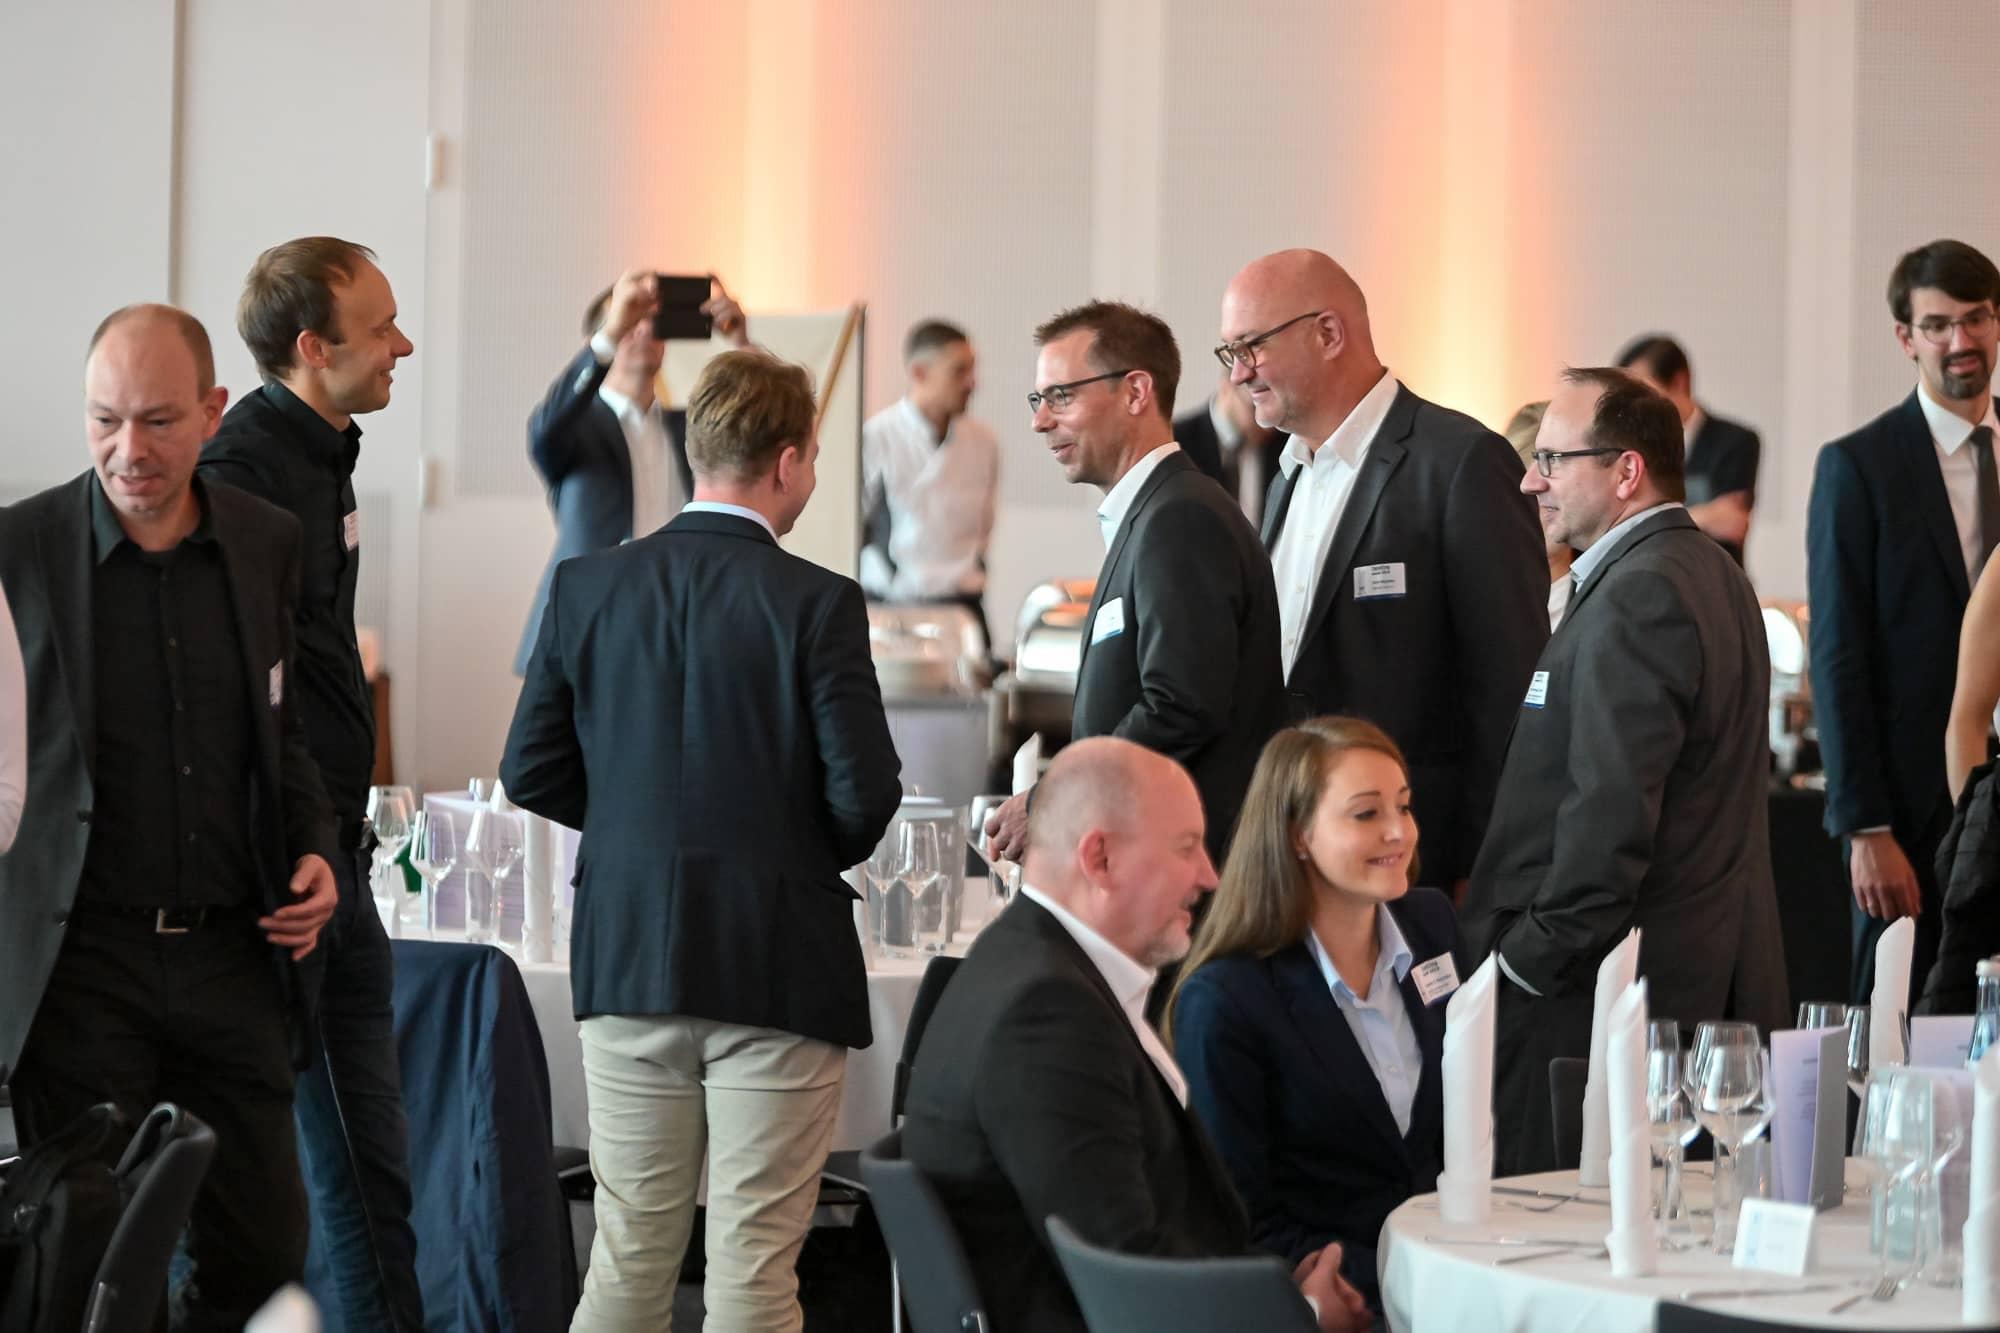 Eventfotografie Stuttgart Messe